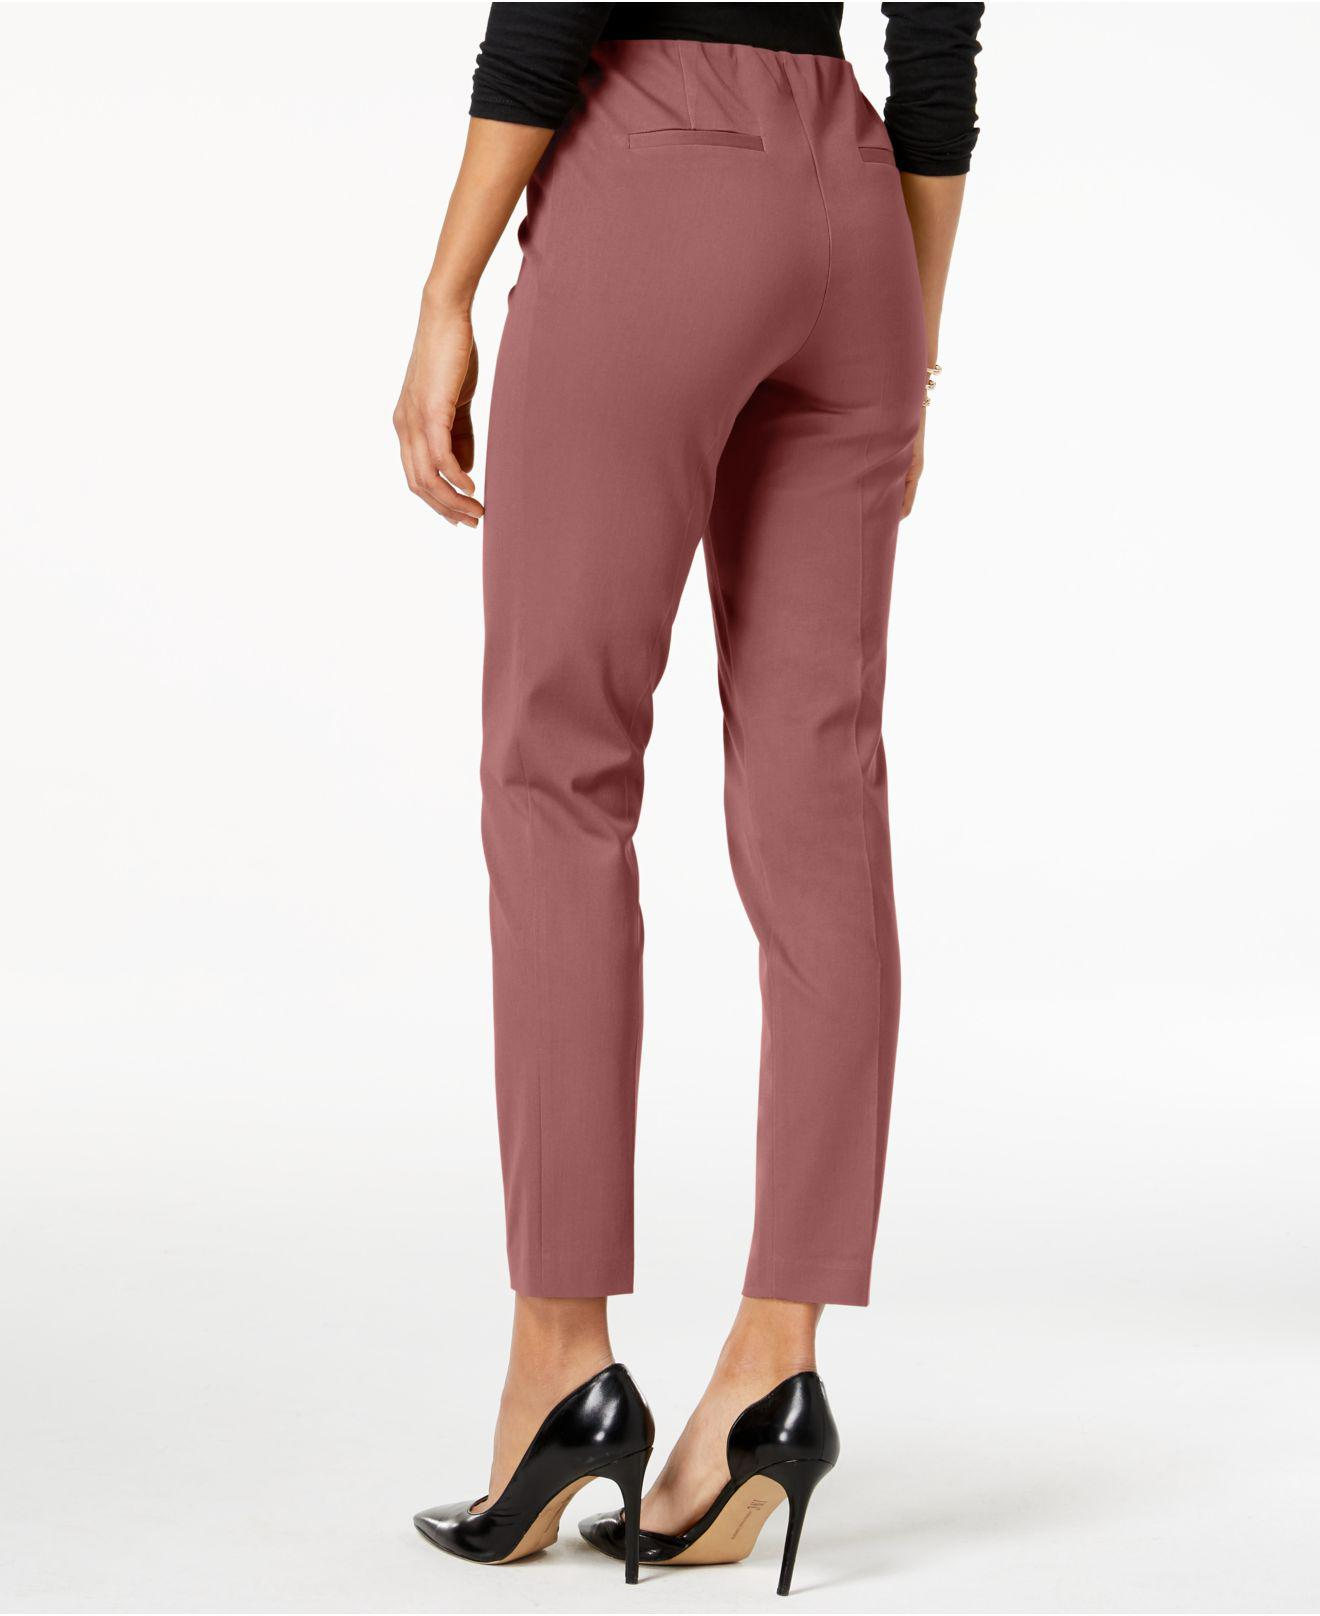 7d6e027dc4a13 Lyst - Alfani Bi-stretch Hollywood Skinny Pants